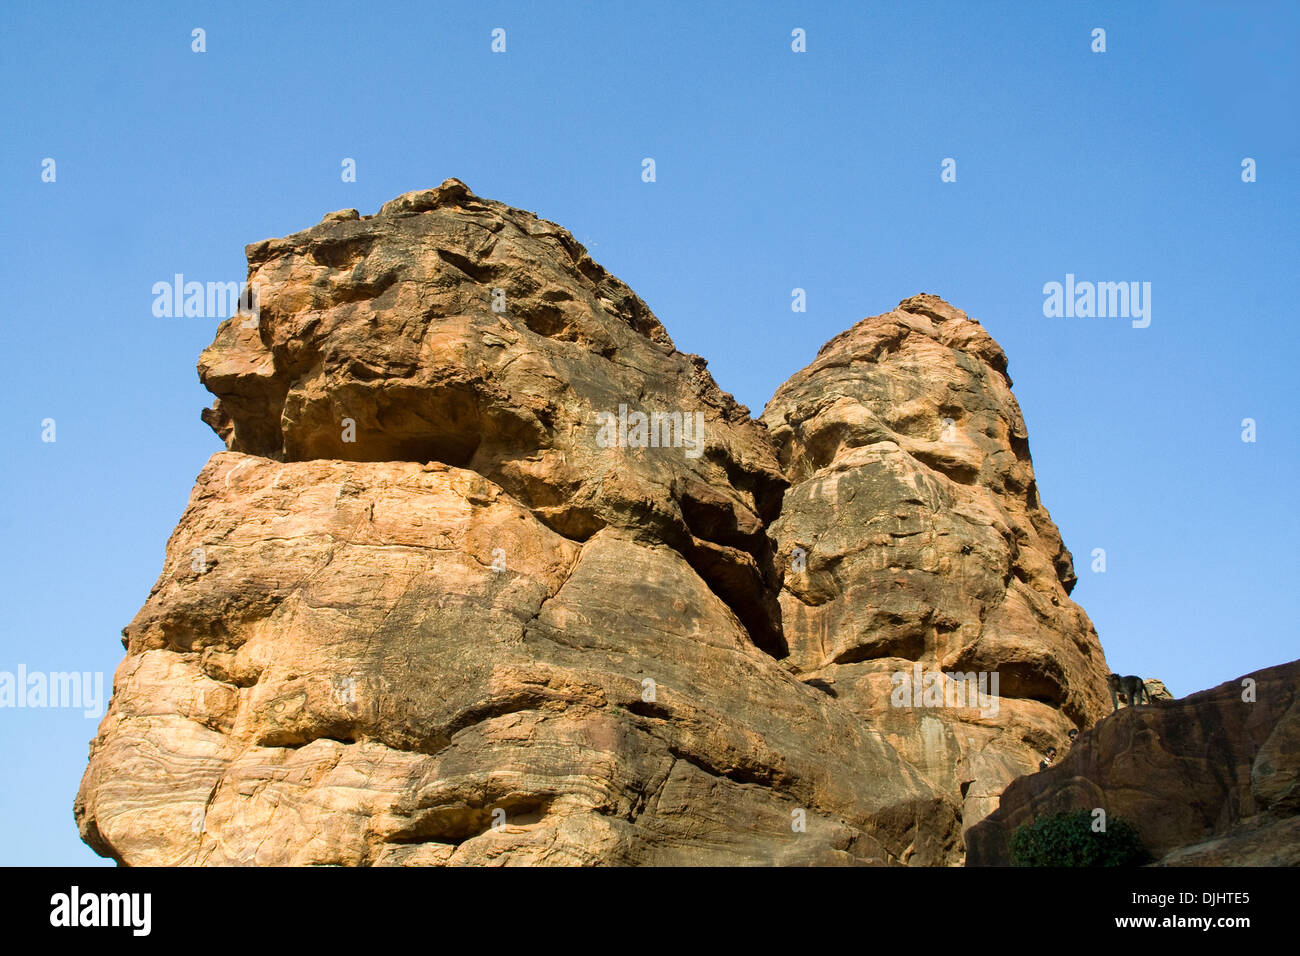 Gigantic rocks on Southern Hill at Badami, Karnataka, India, Asia - Stock Image